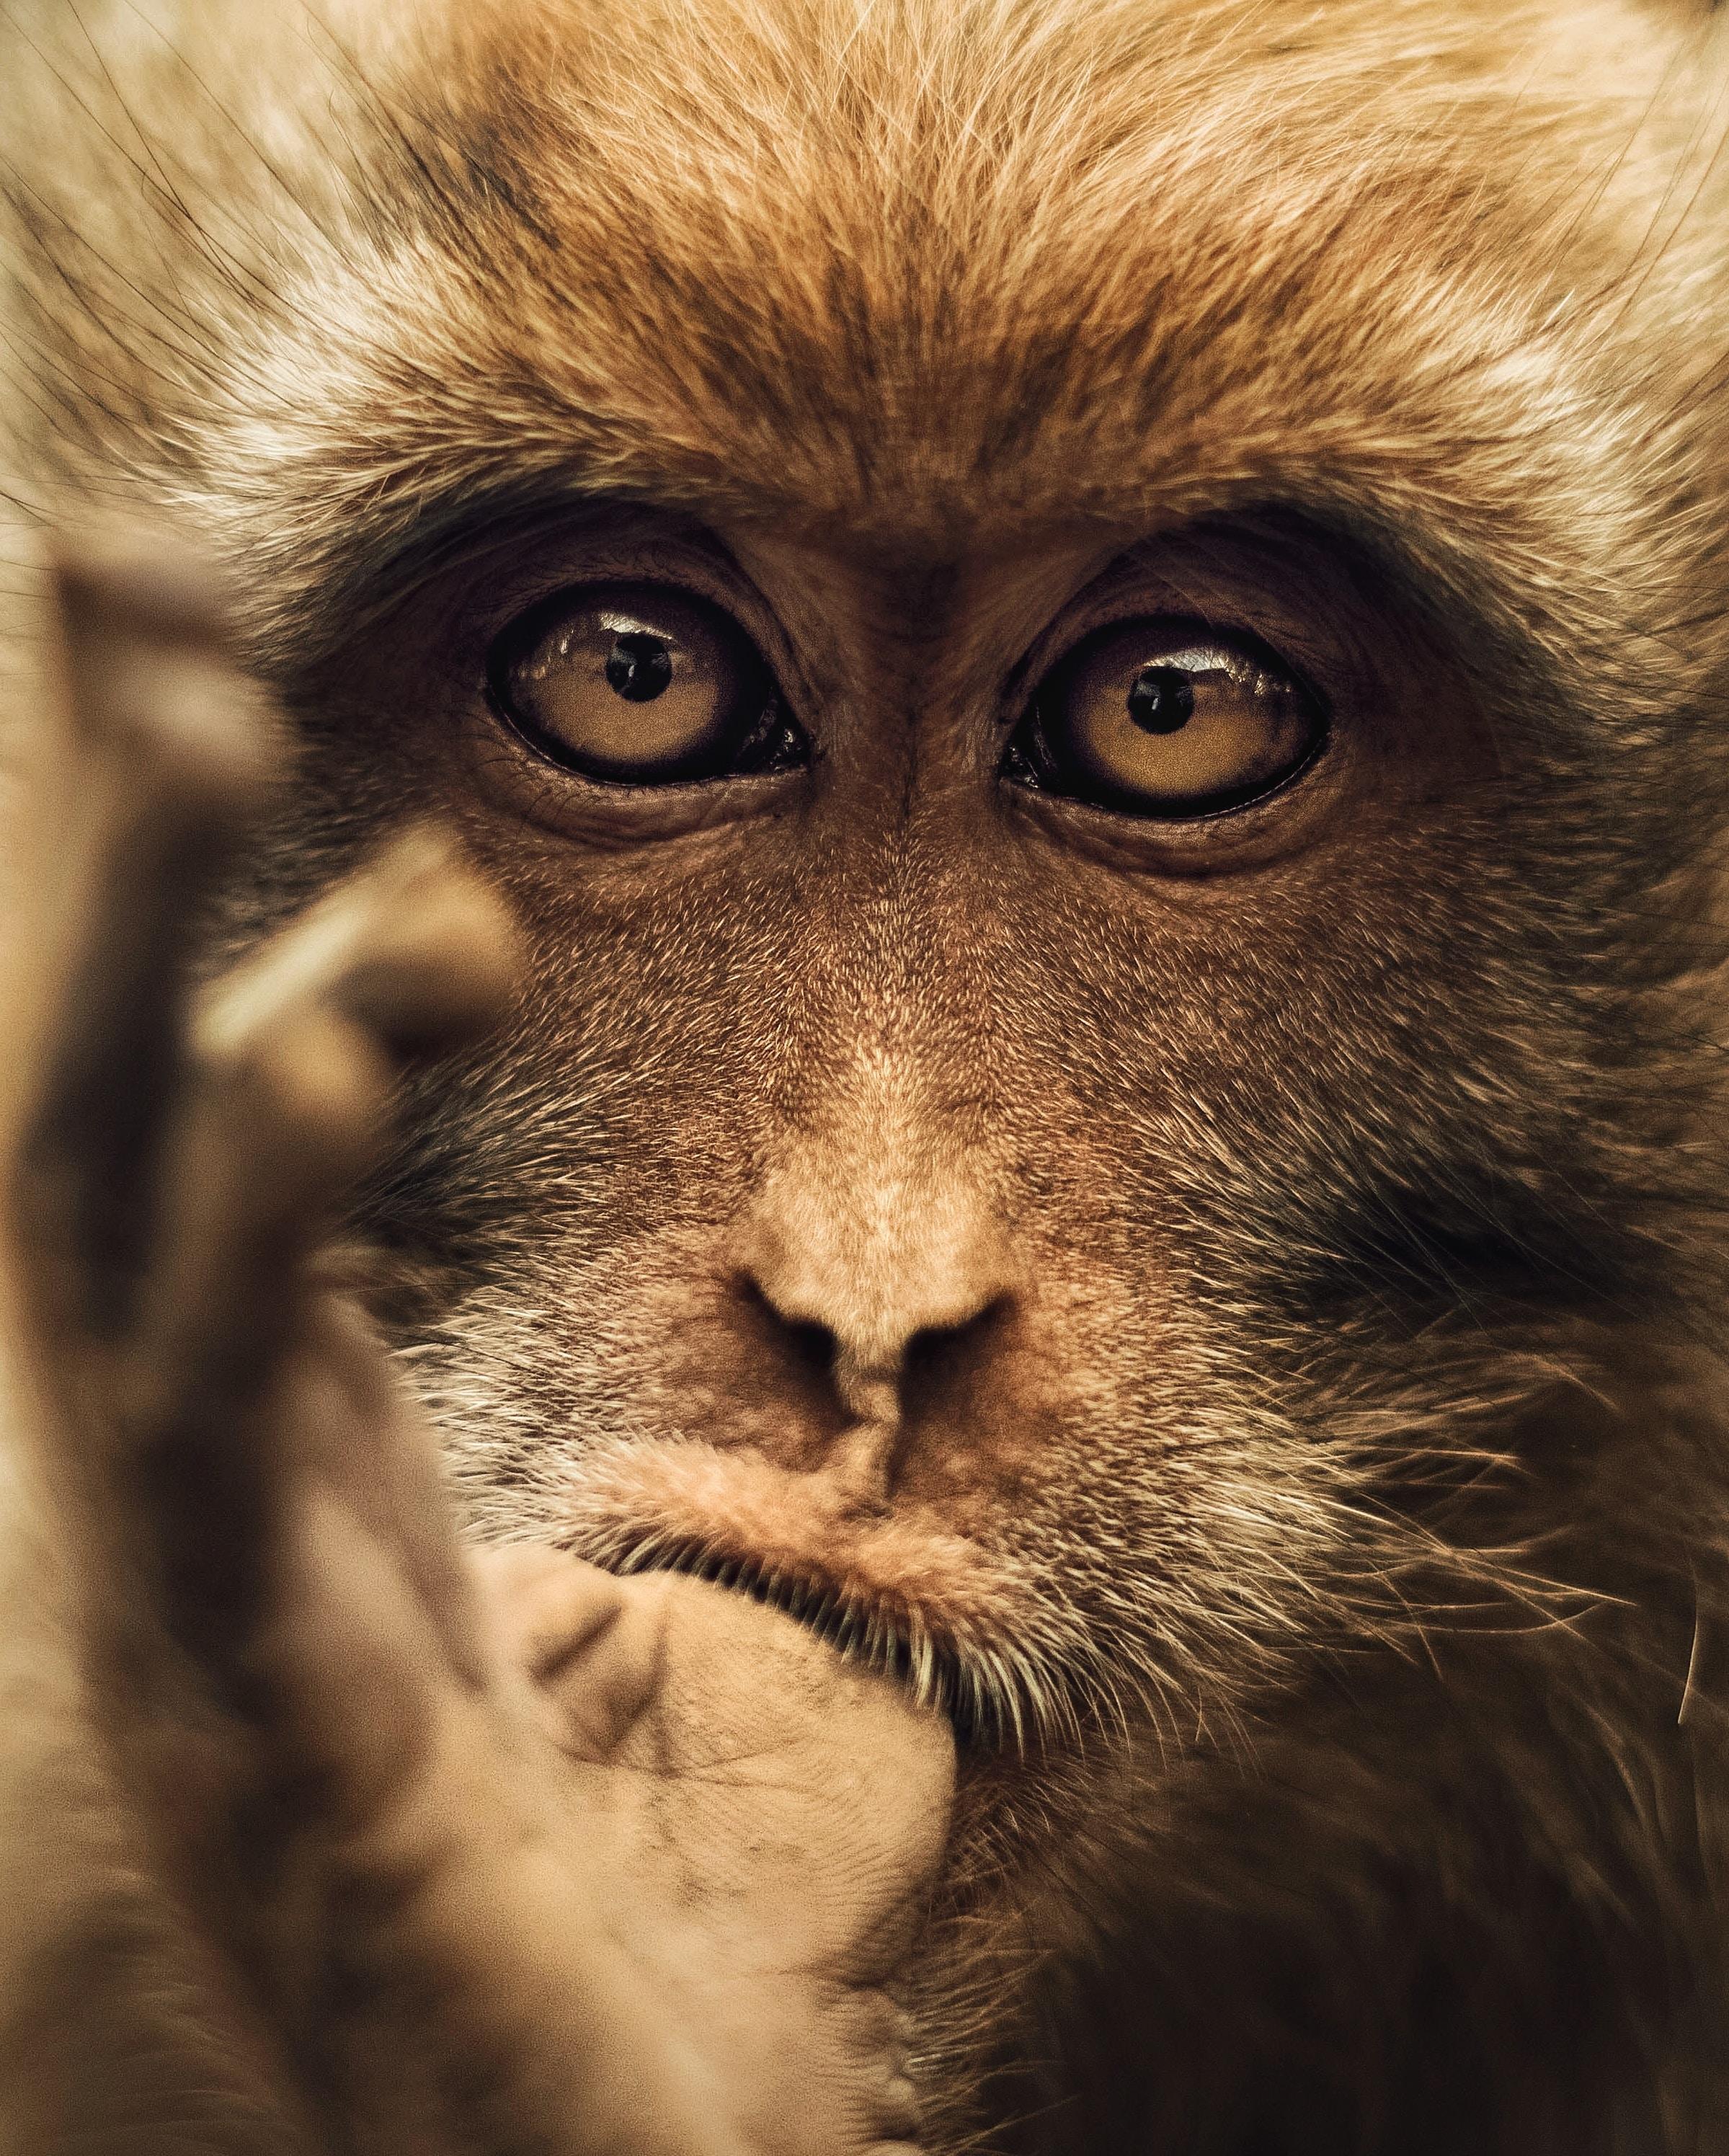 closeup photo of brown primate